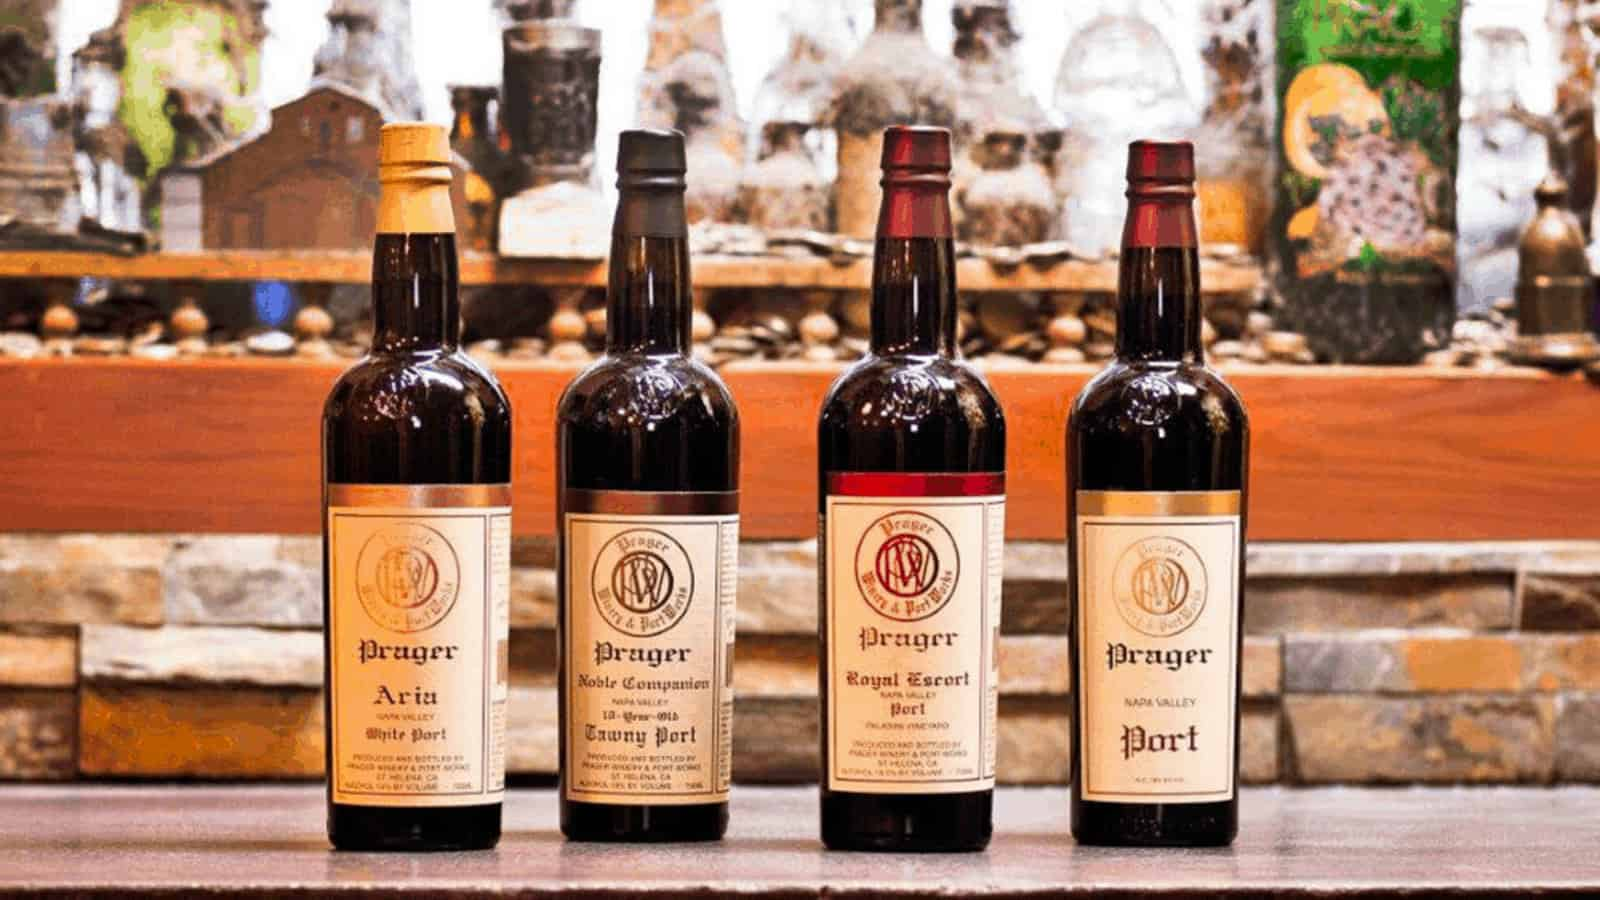 Prager Winery & Port Works